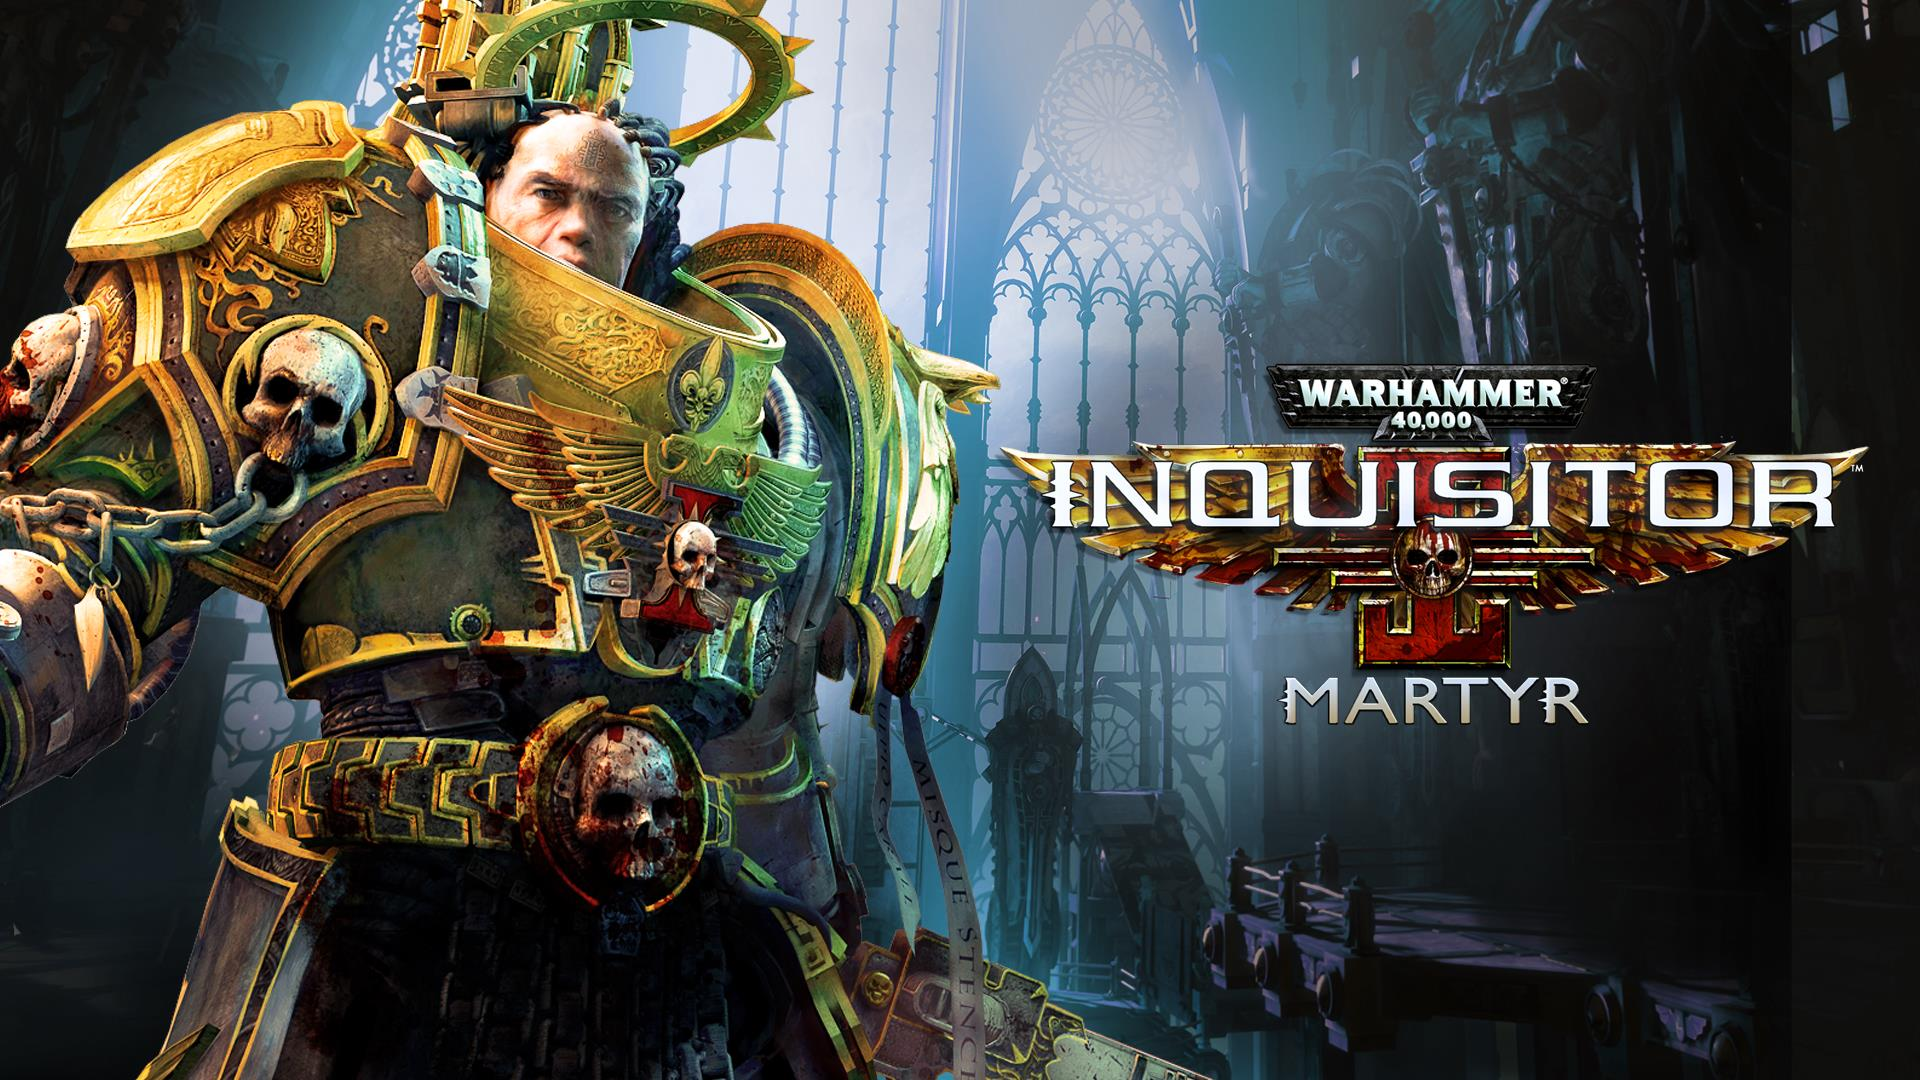 Imagini pentru Warhammer 40,000: Inquisitor - Martyr